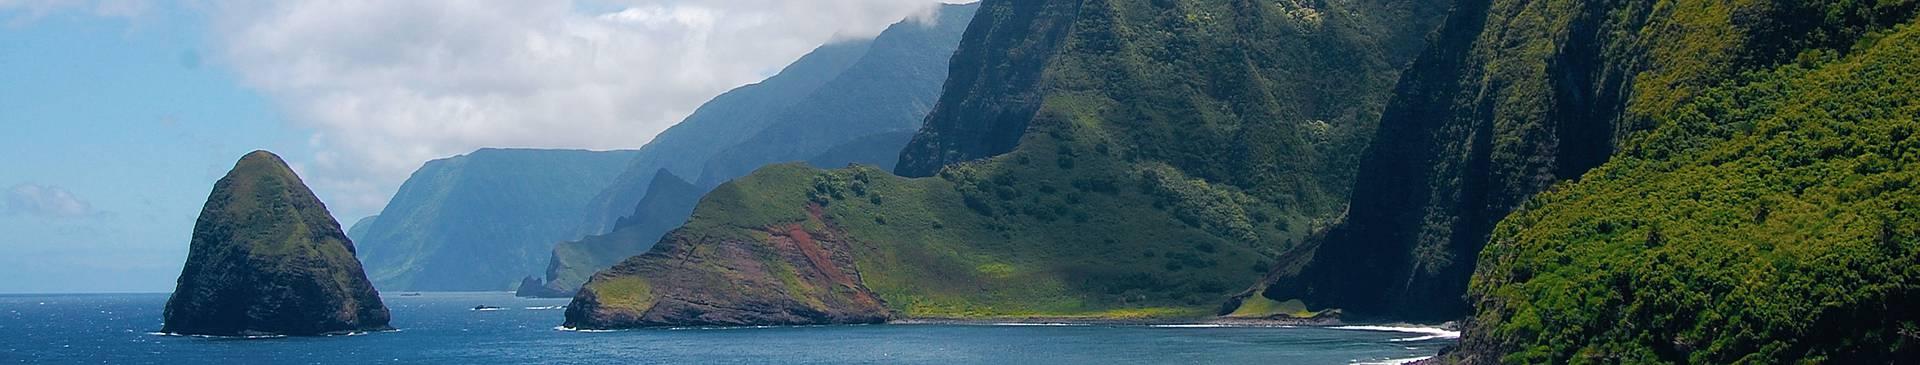 Bergurlaub Hawaii